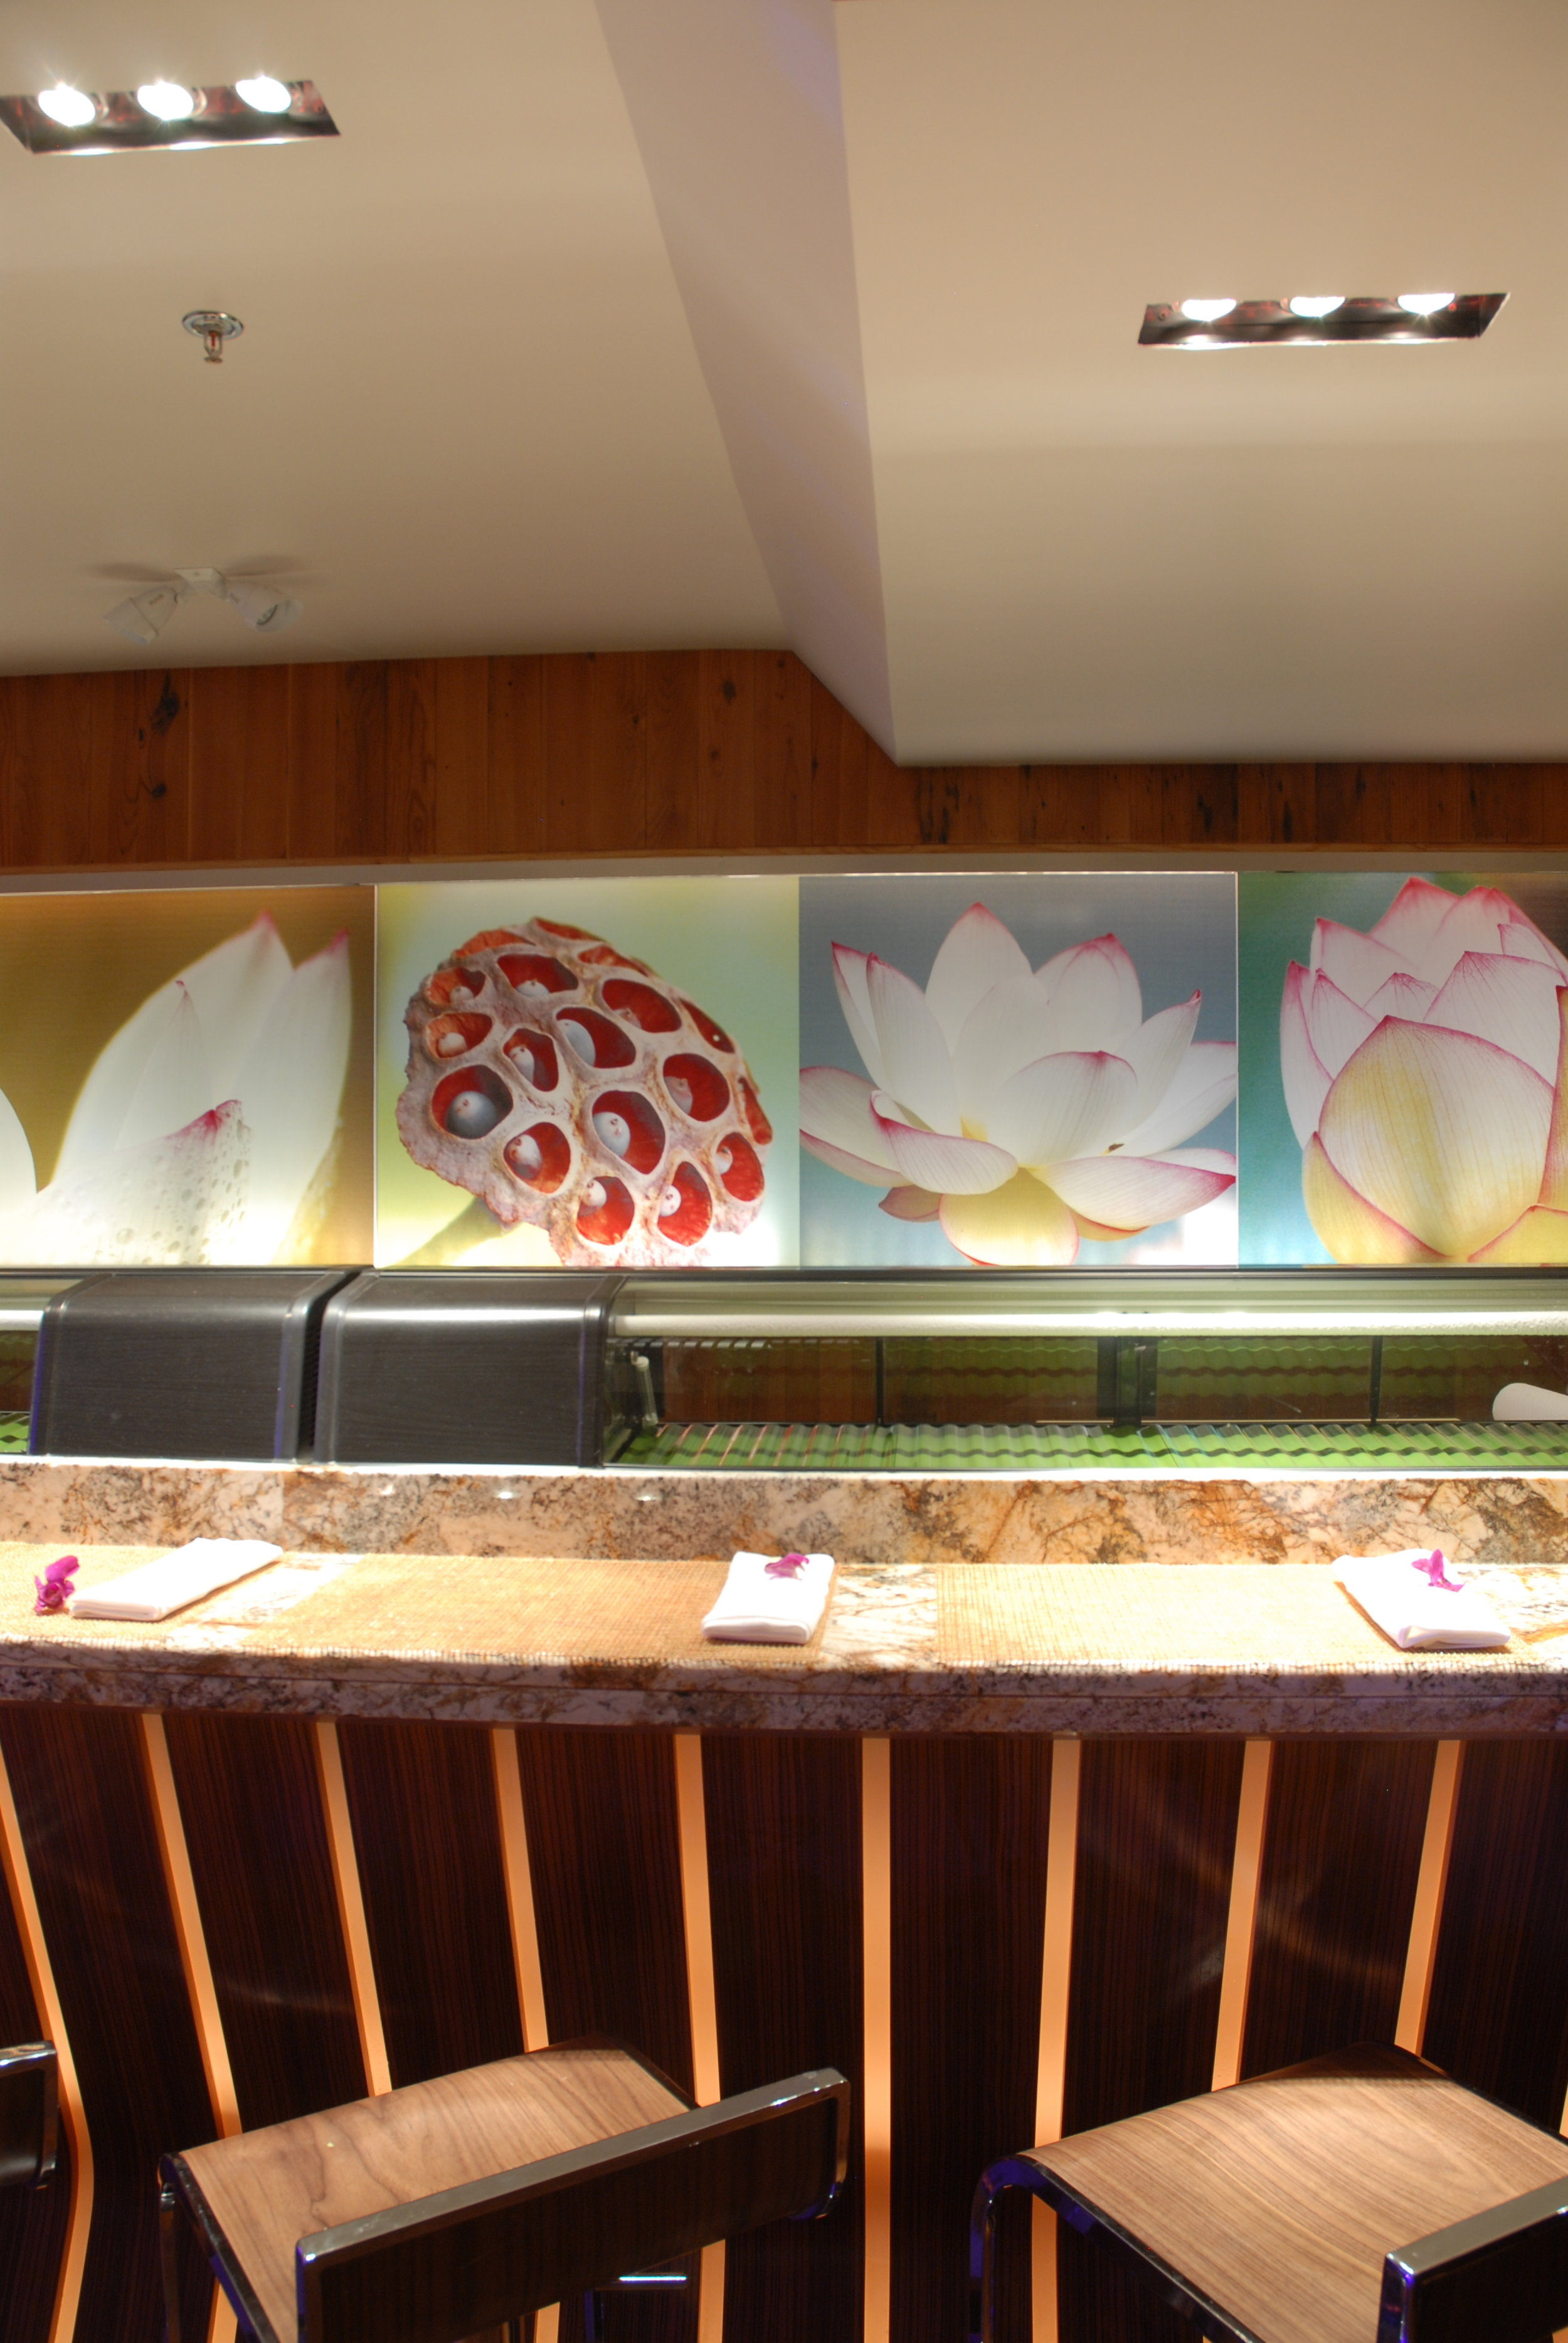 studio-saint-bars-and-restaurants-lotus-lounge-washington-dc-4